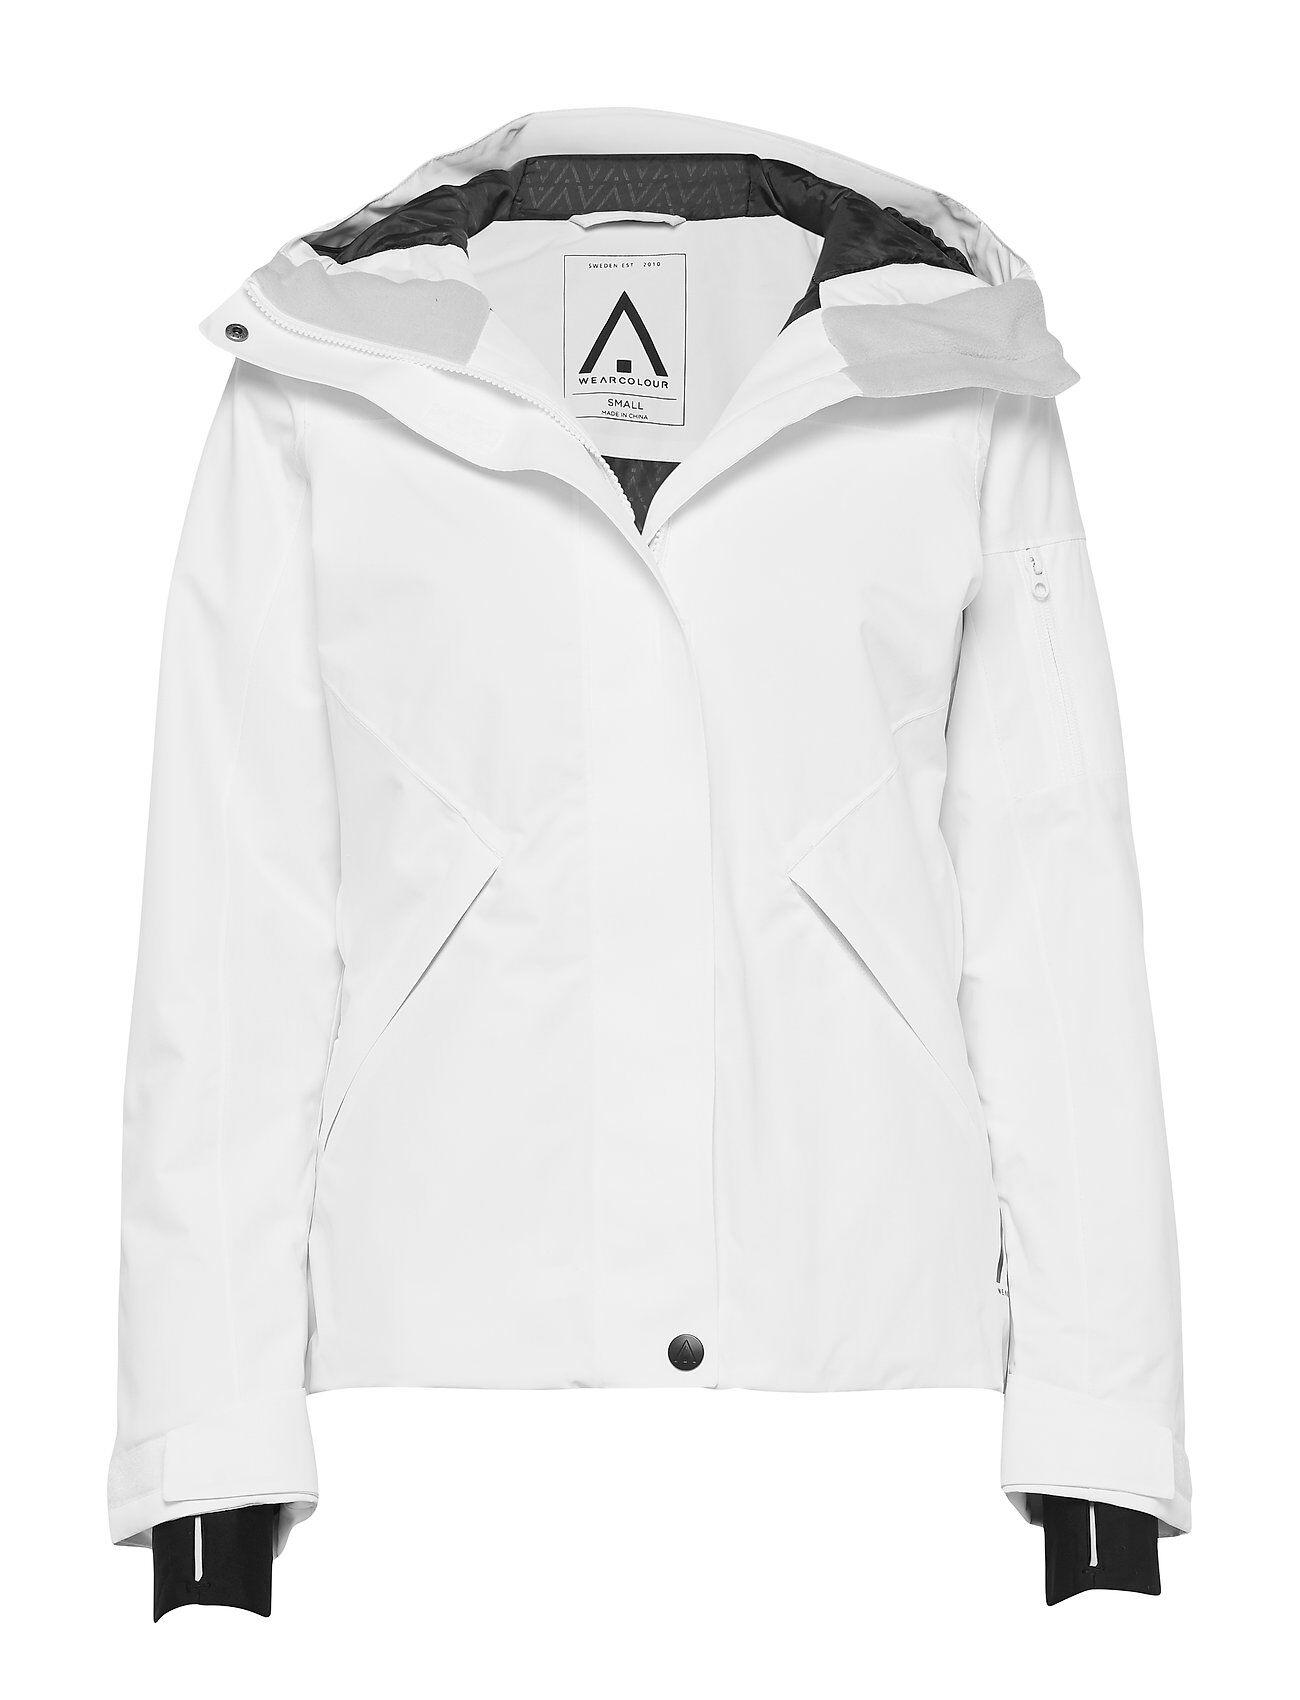 WearColour Base Jacket Outerwear Sport Jackets Valkoinen WearColour